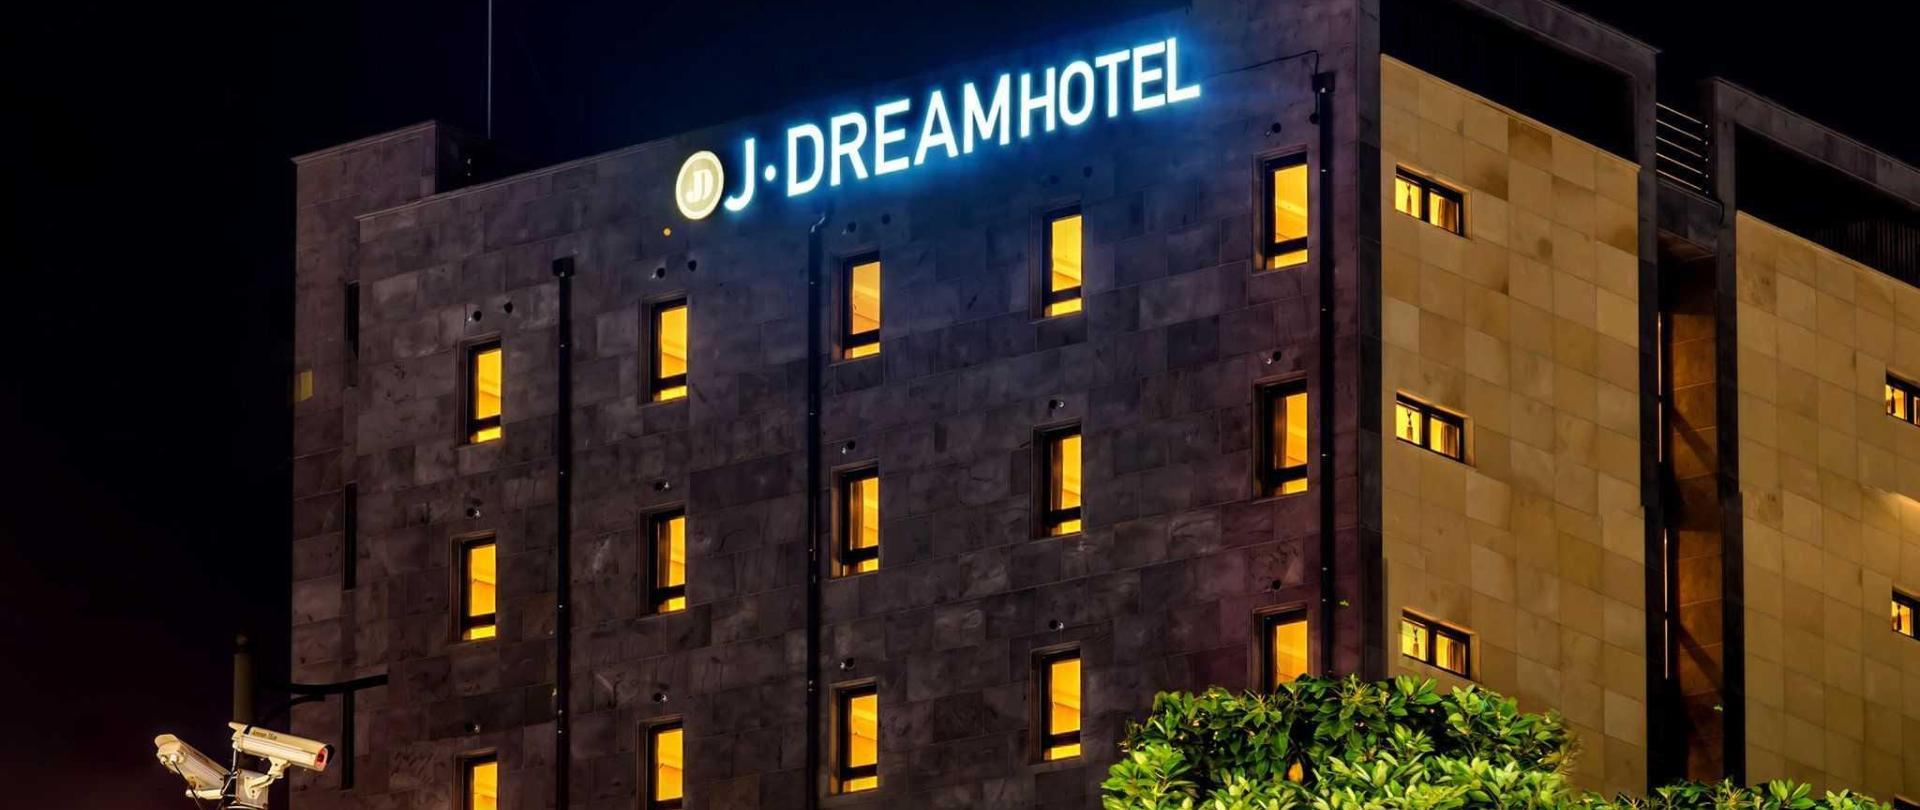 j-dream-hotel-01.jpg